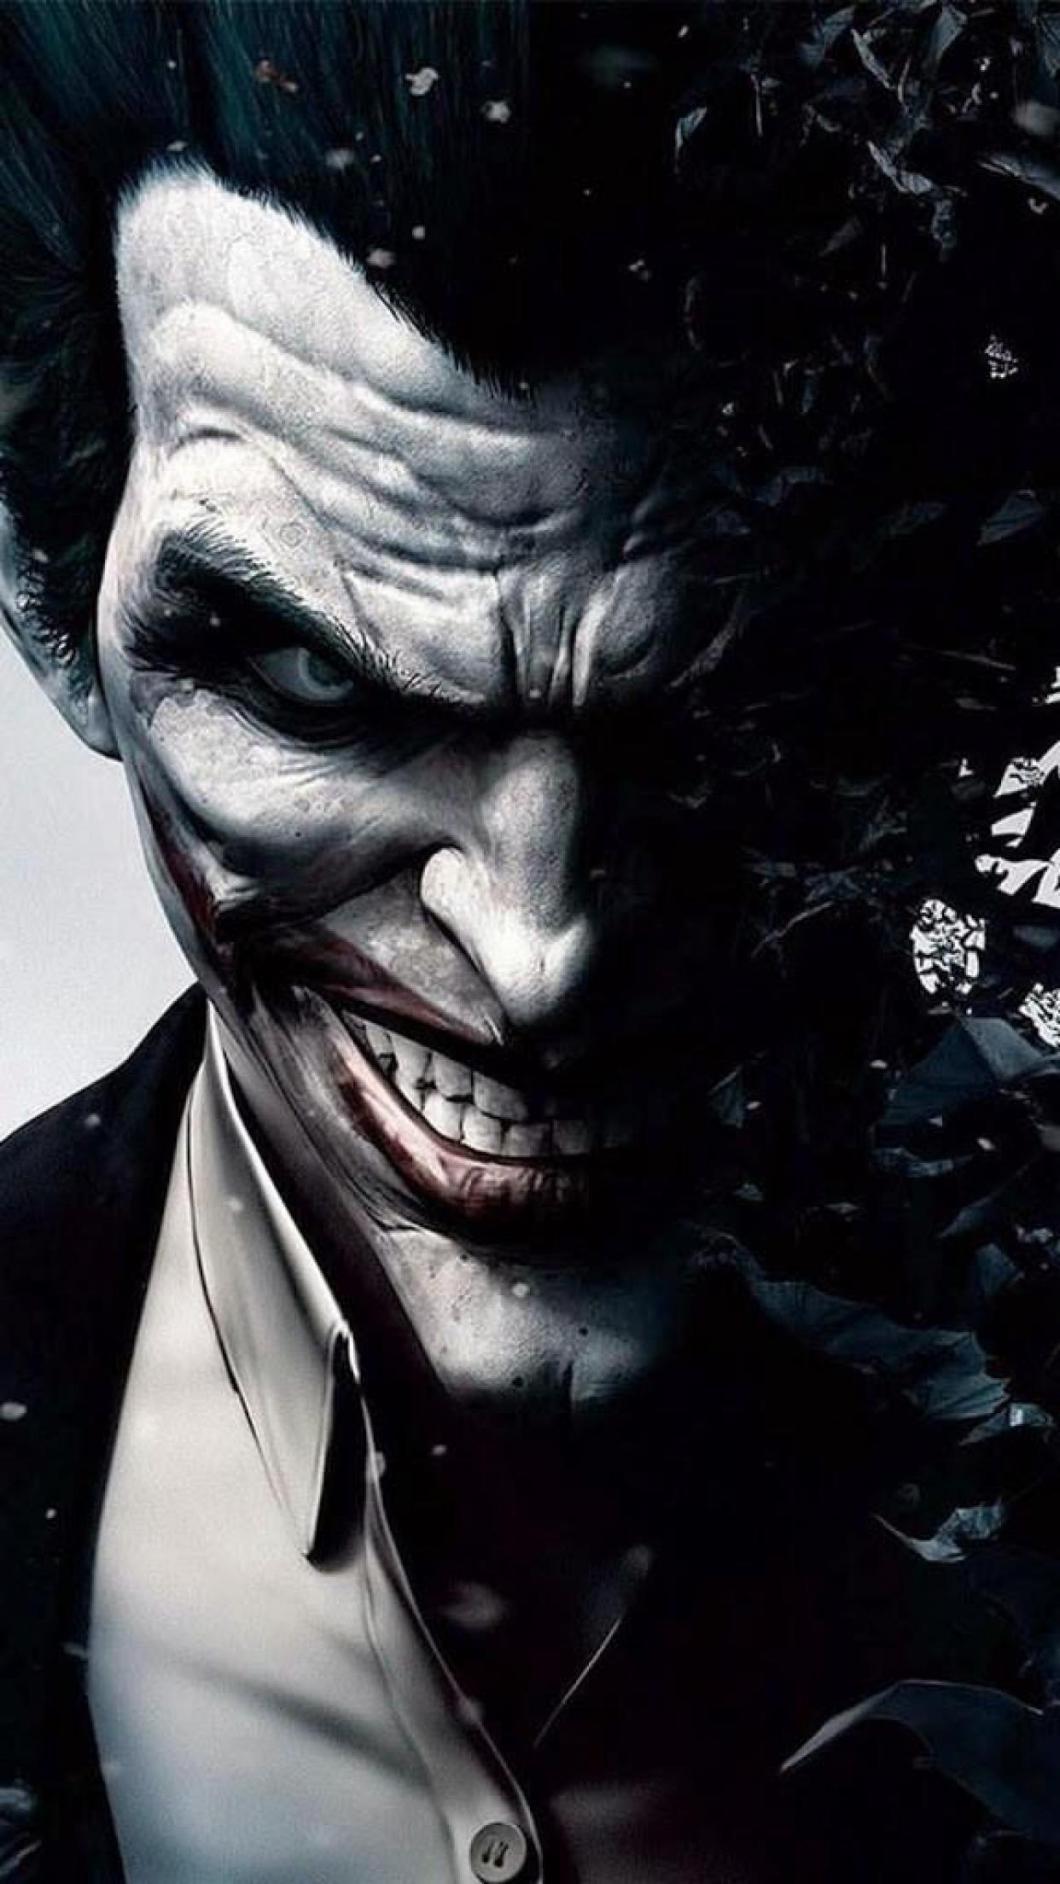 Joker Mobile Wallpapers Wallpaper Cave